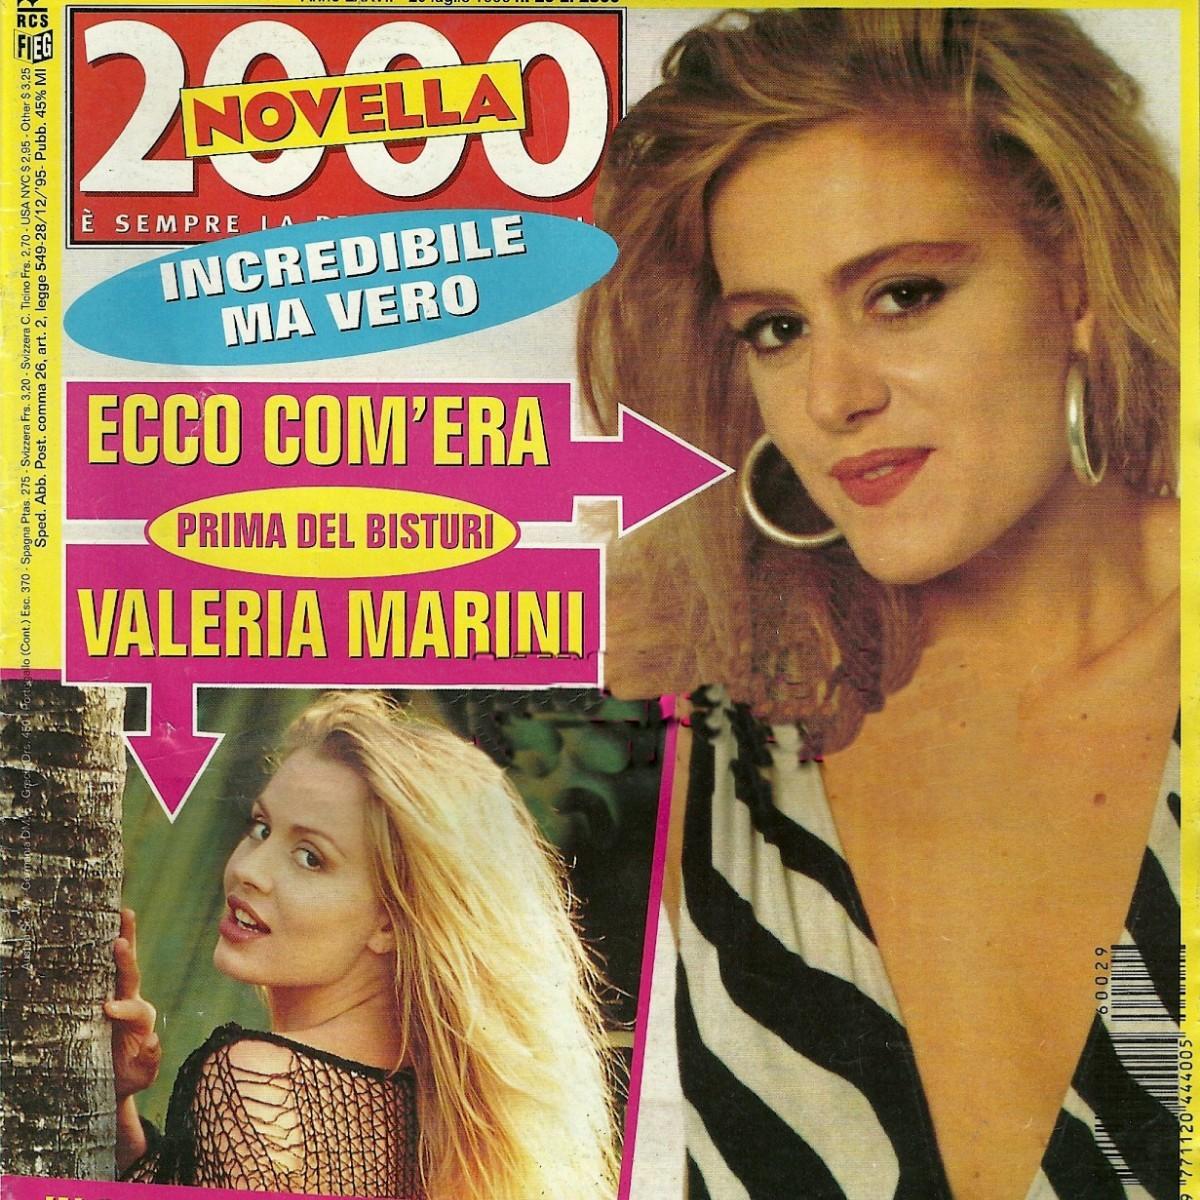 Valeria Marini Giovane